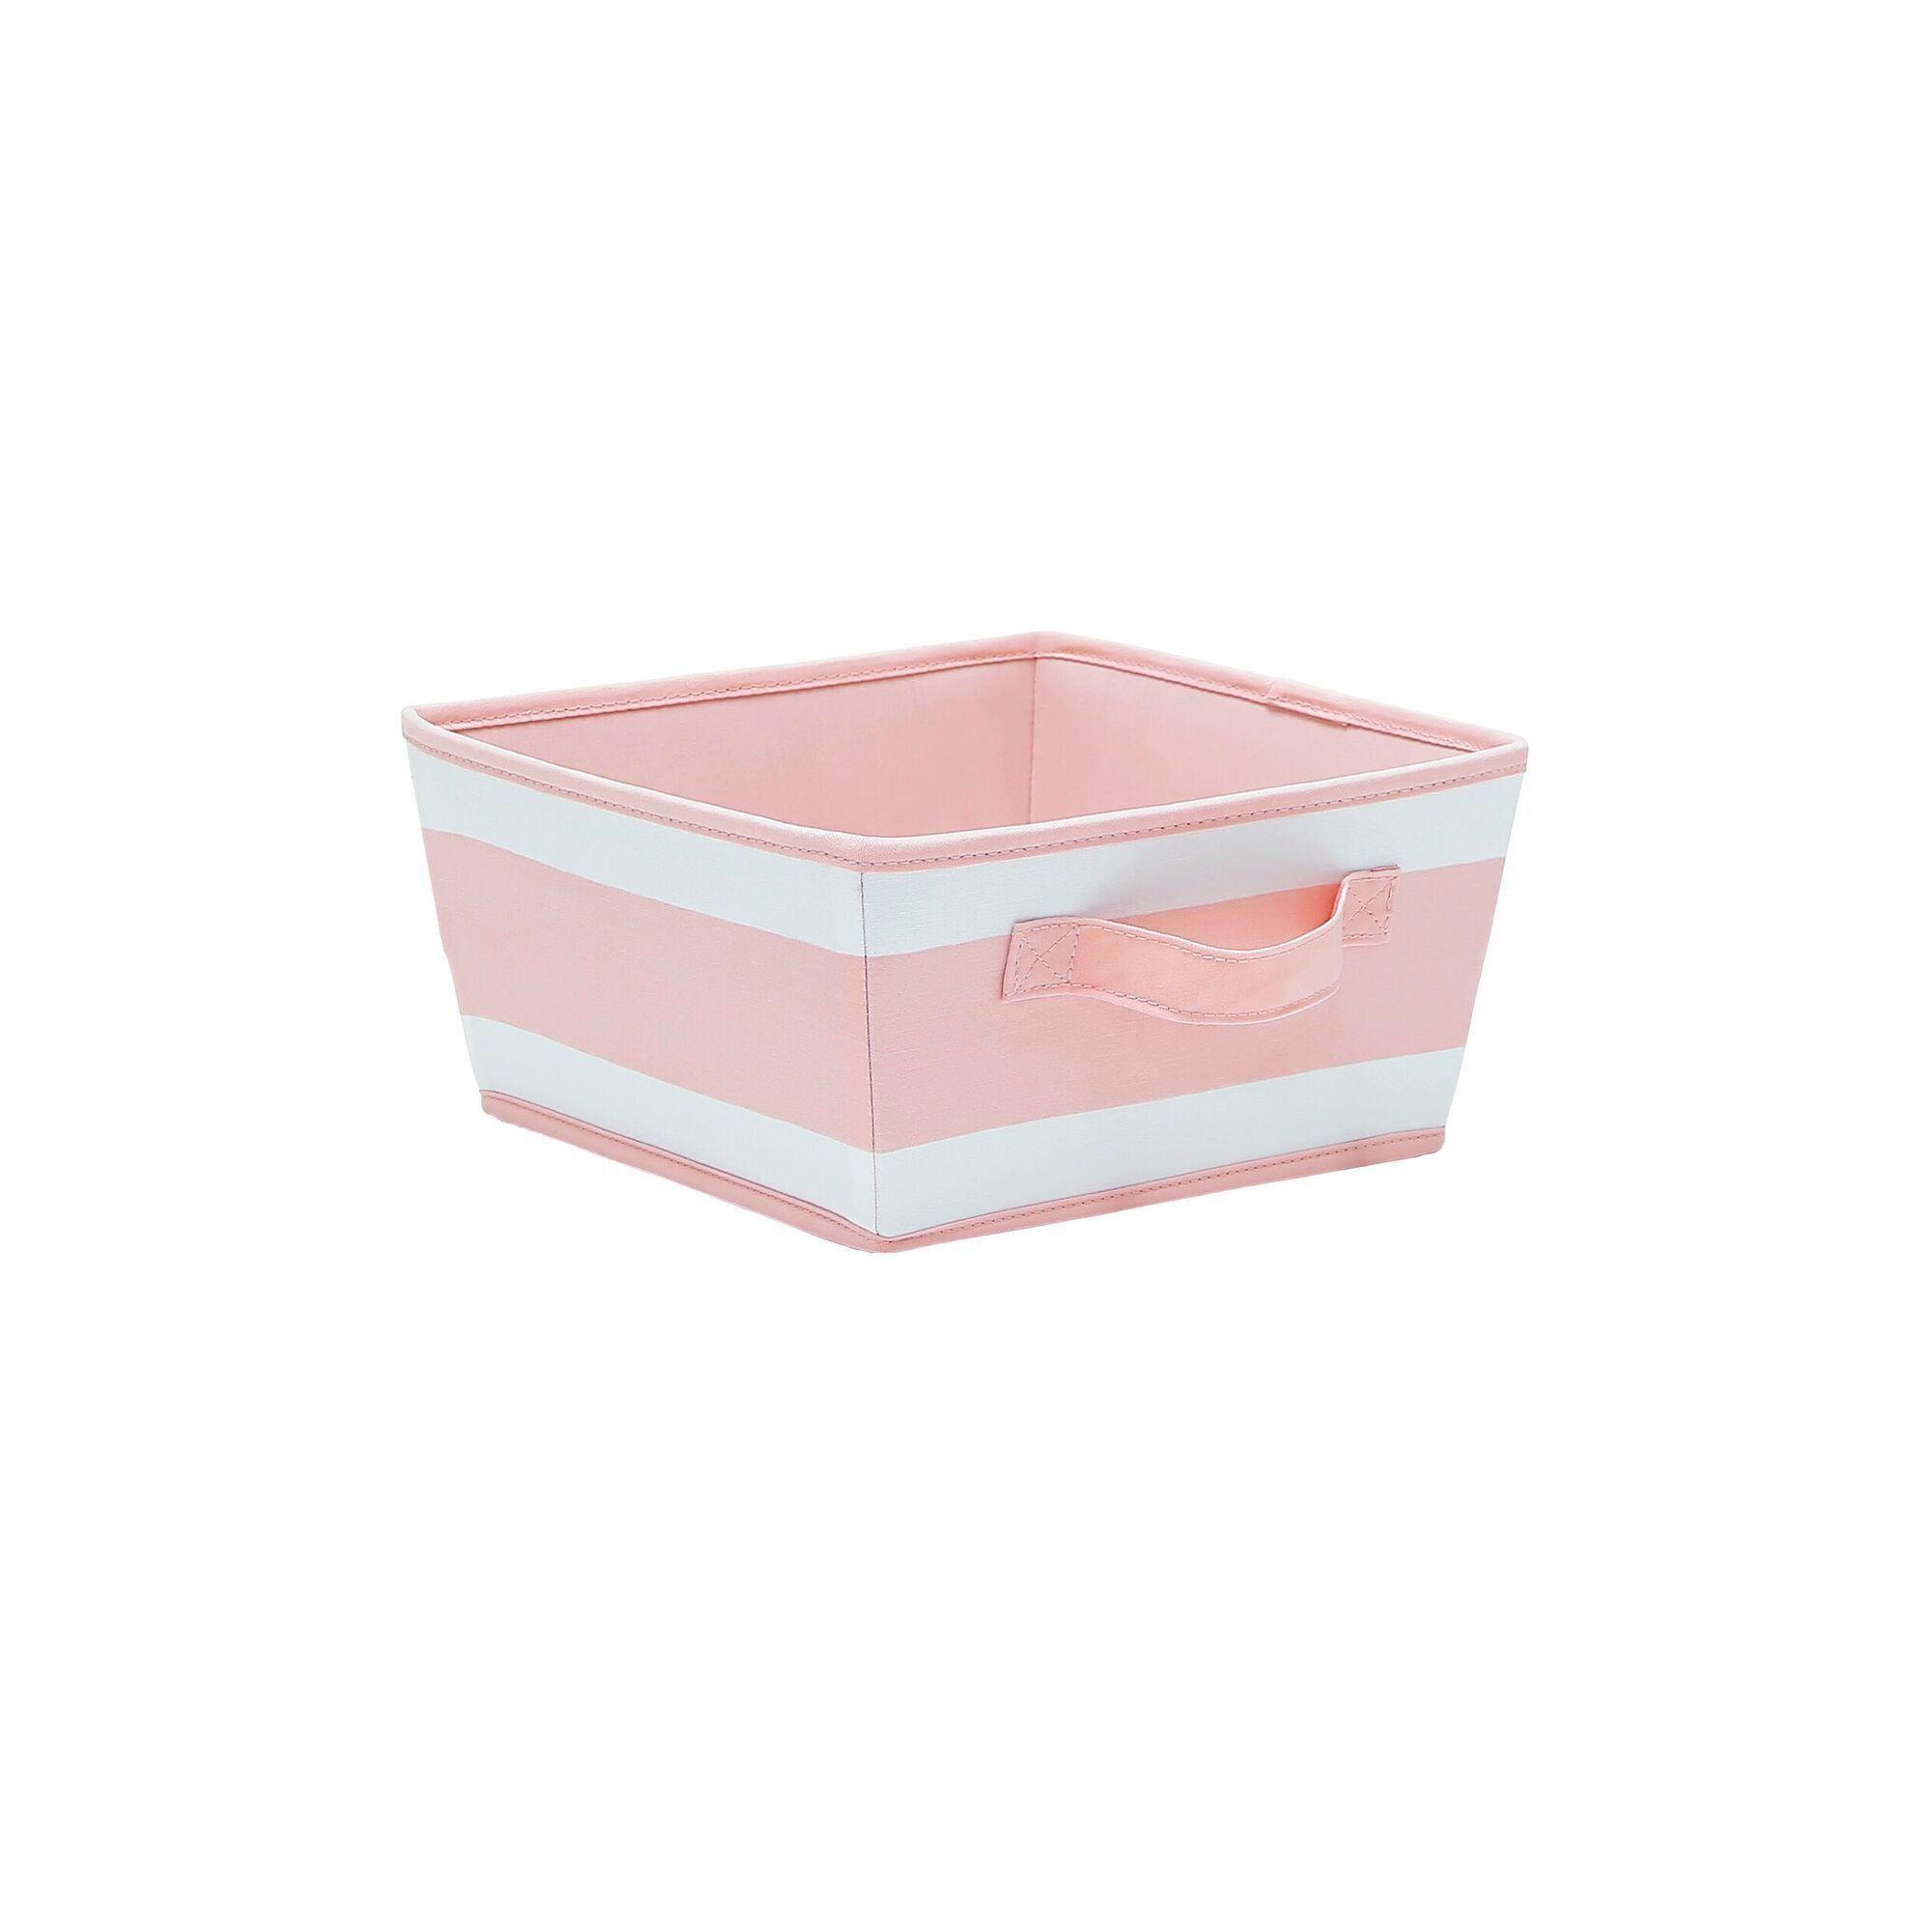 Small Striped Fabric Toy Storage Bin Pink - Pillowfort